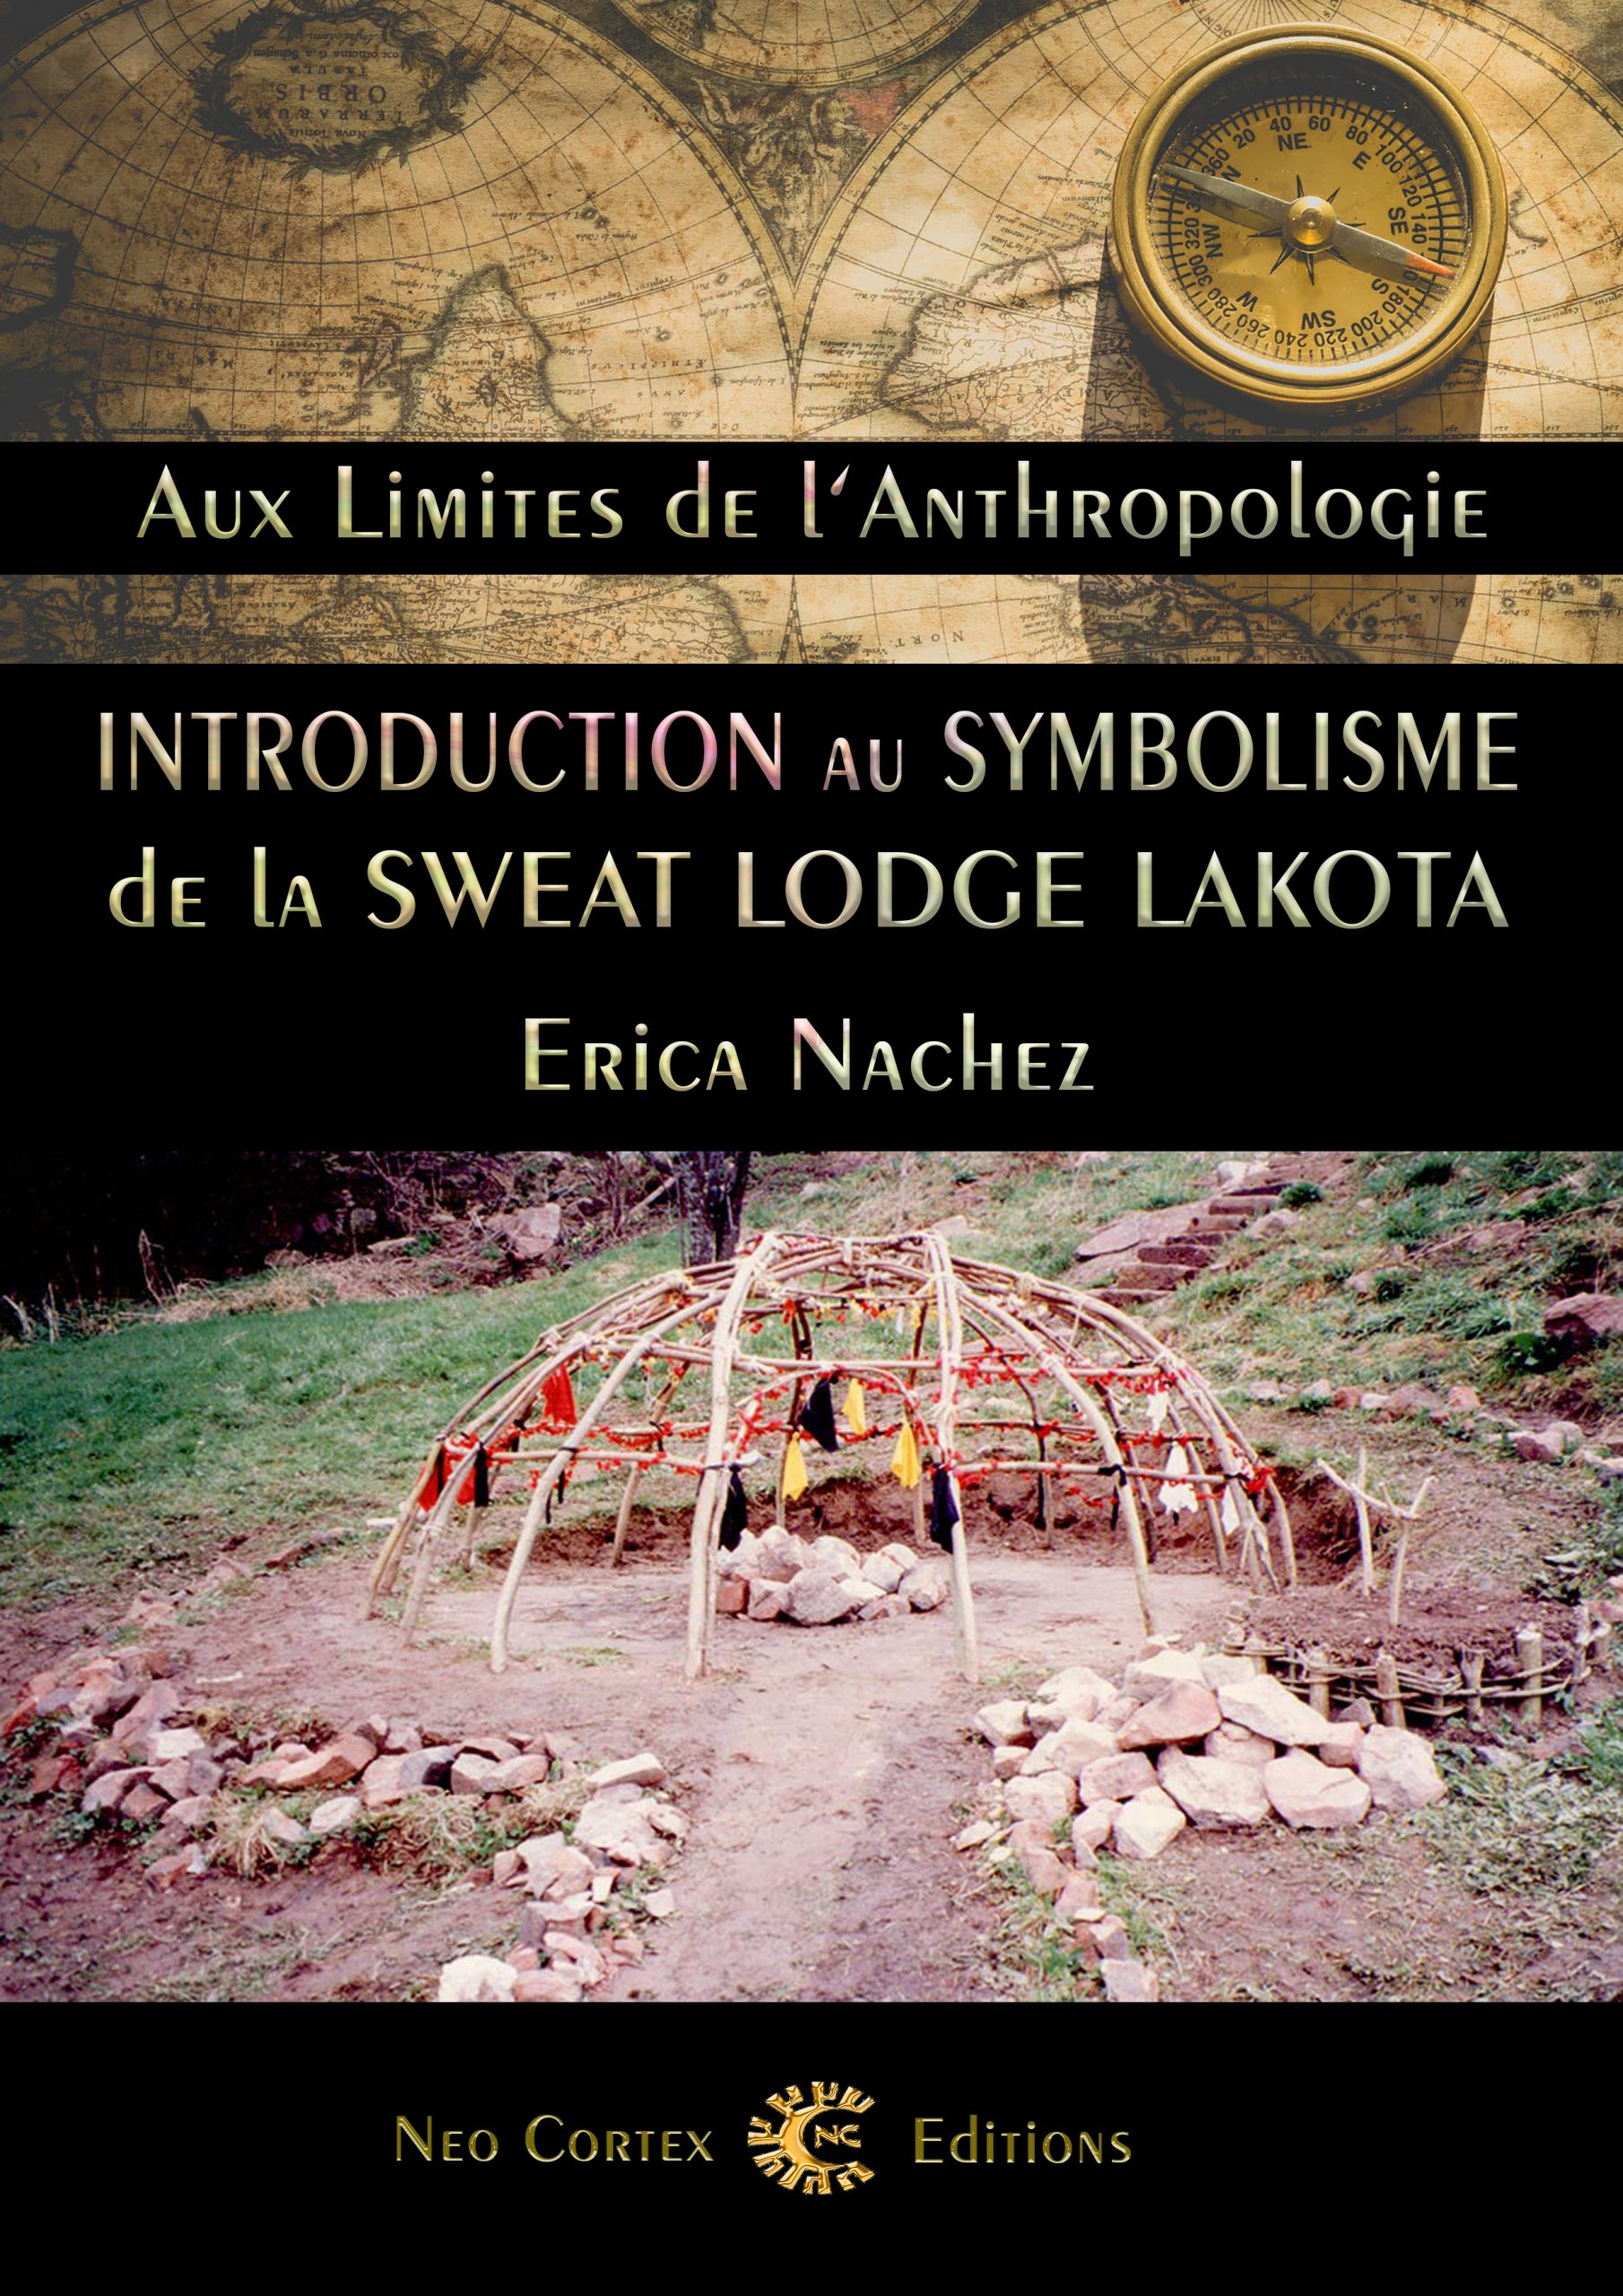 Introduction au Symbolisme de la Sweat Lodge Lakota